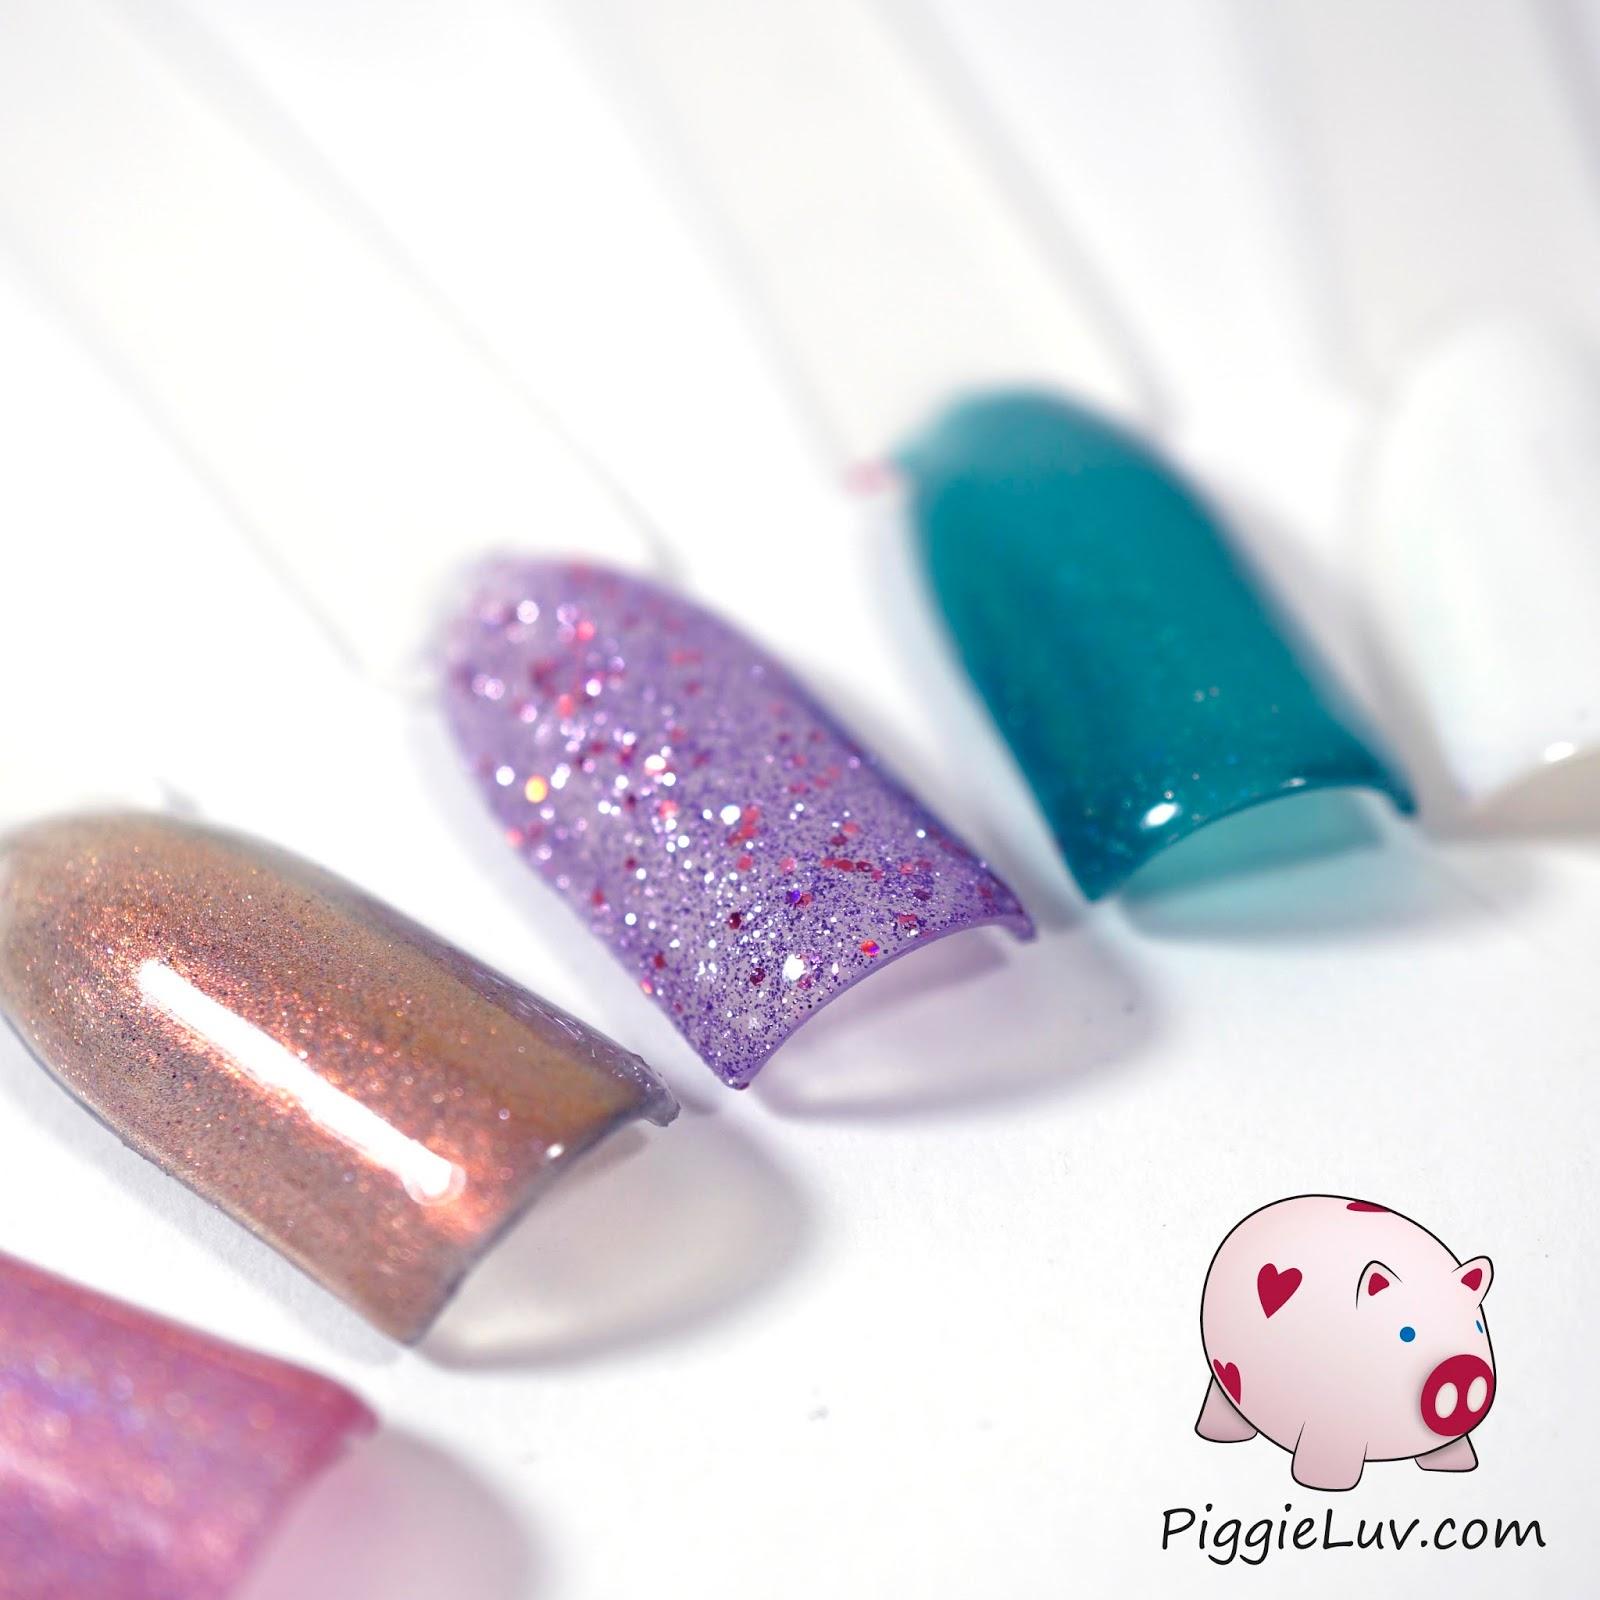 PiggieLuv: Turning regular nail polish into gel polish with Gelibility